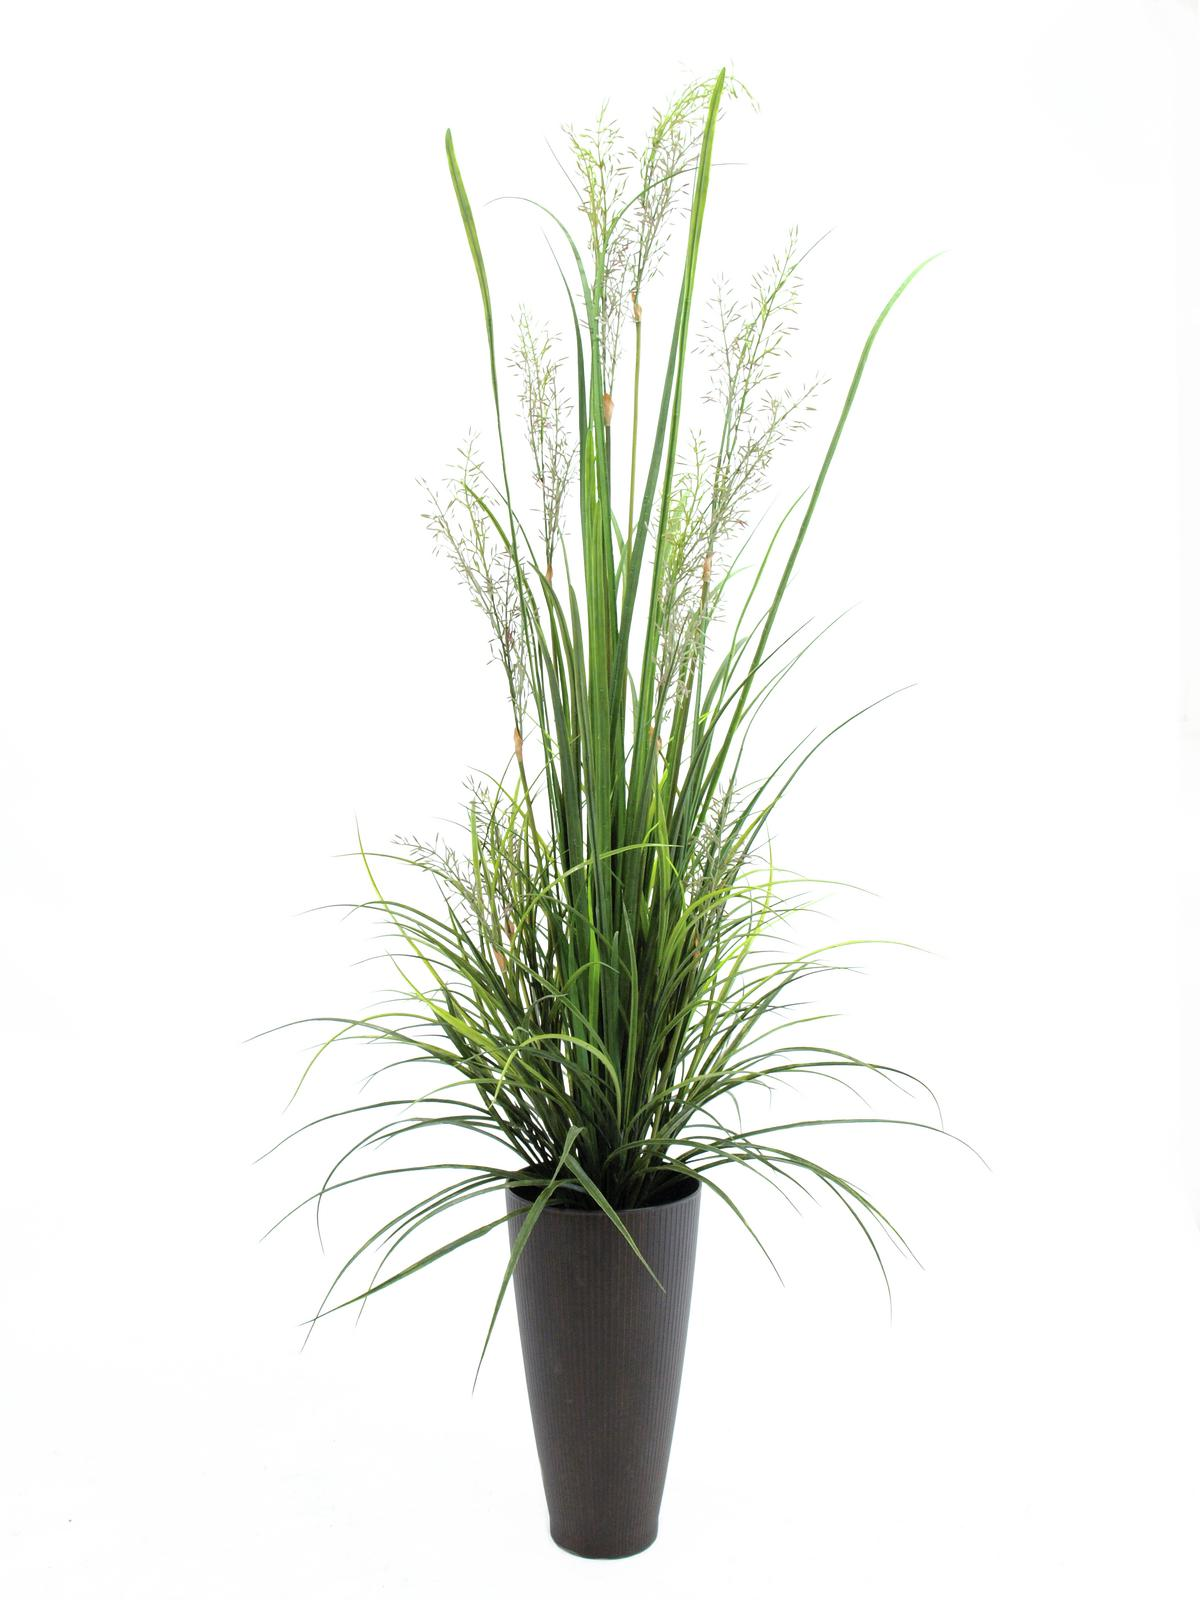 europalms-schilfgras-april-175cm-kunststoffpflanze